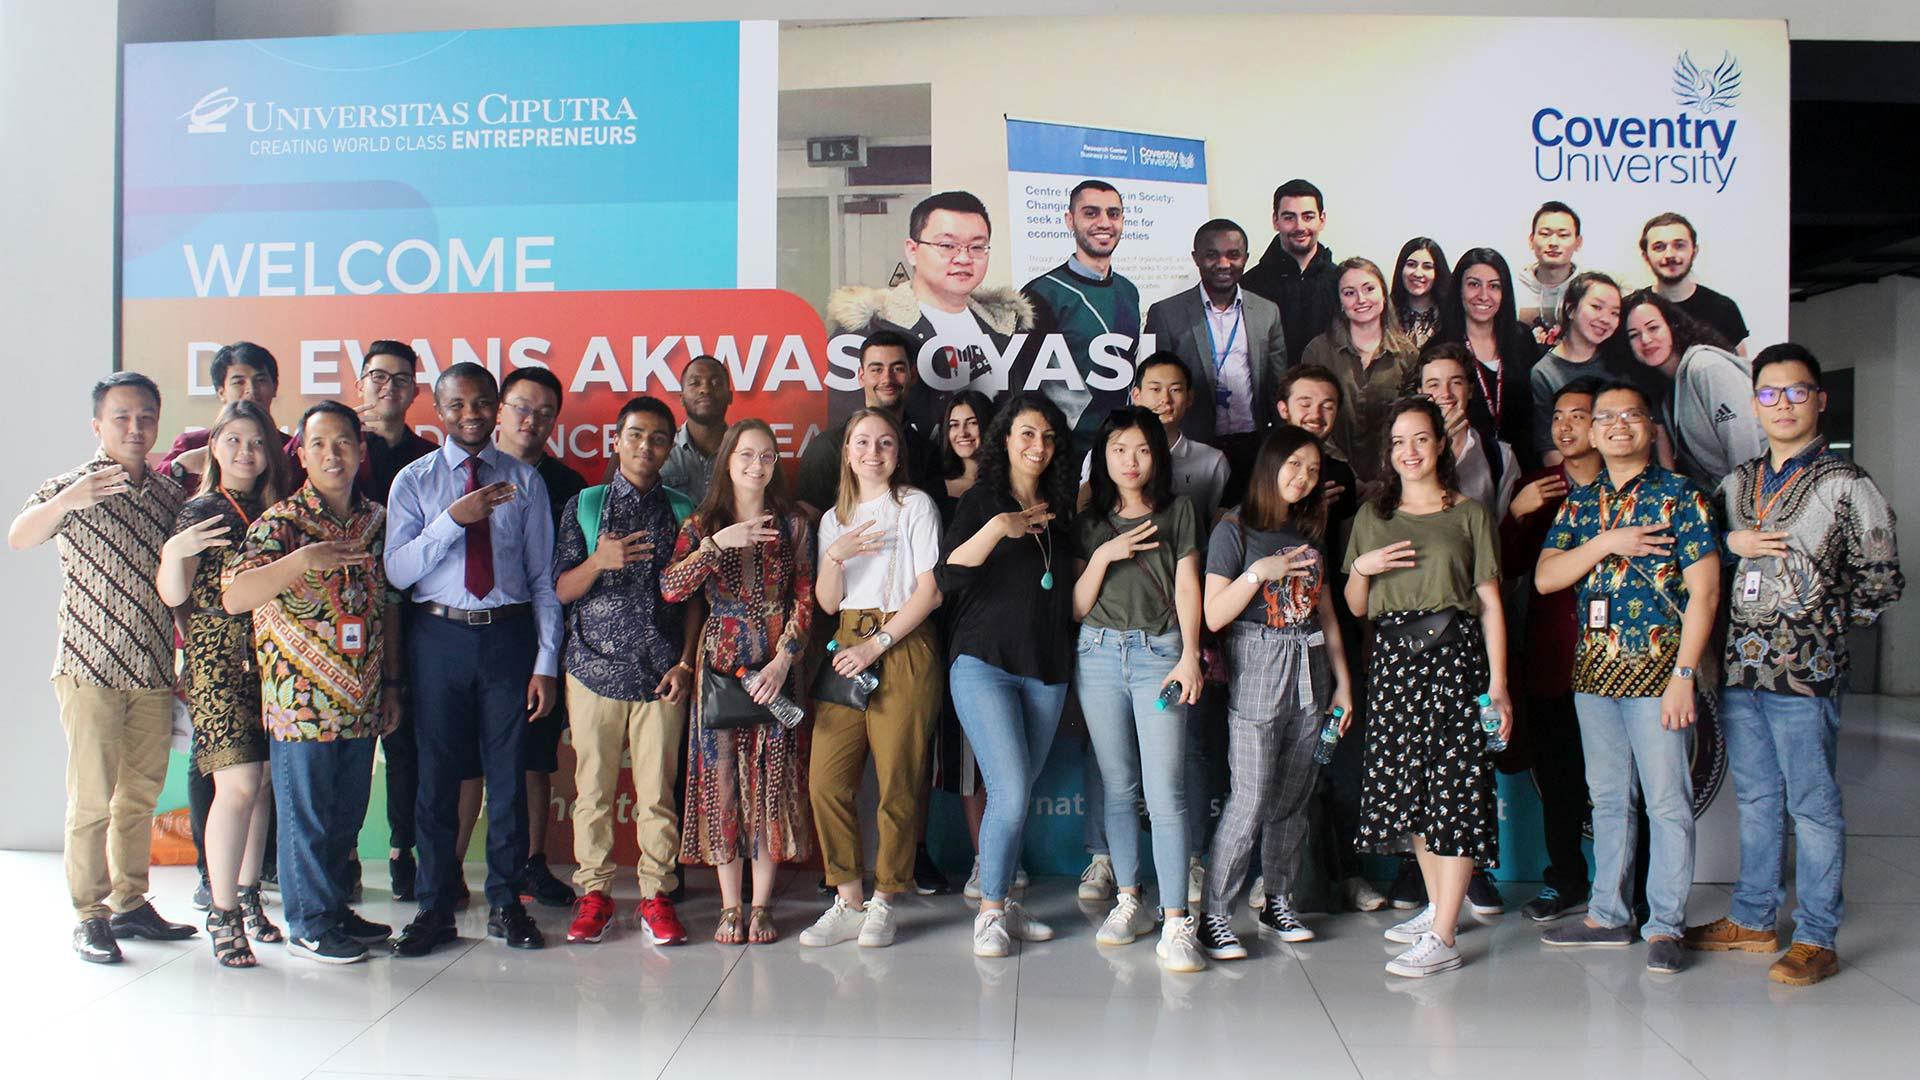 Coventry University UK visit to UC